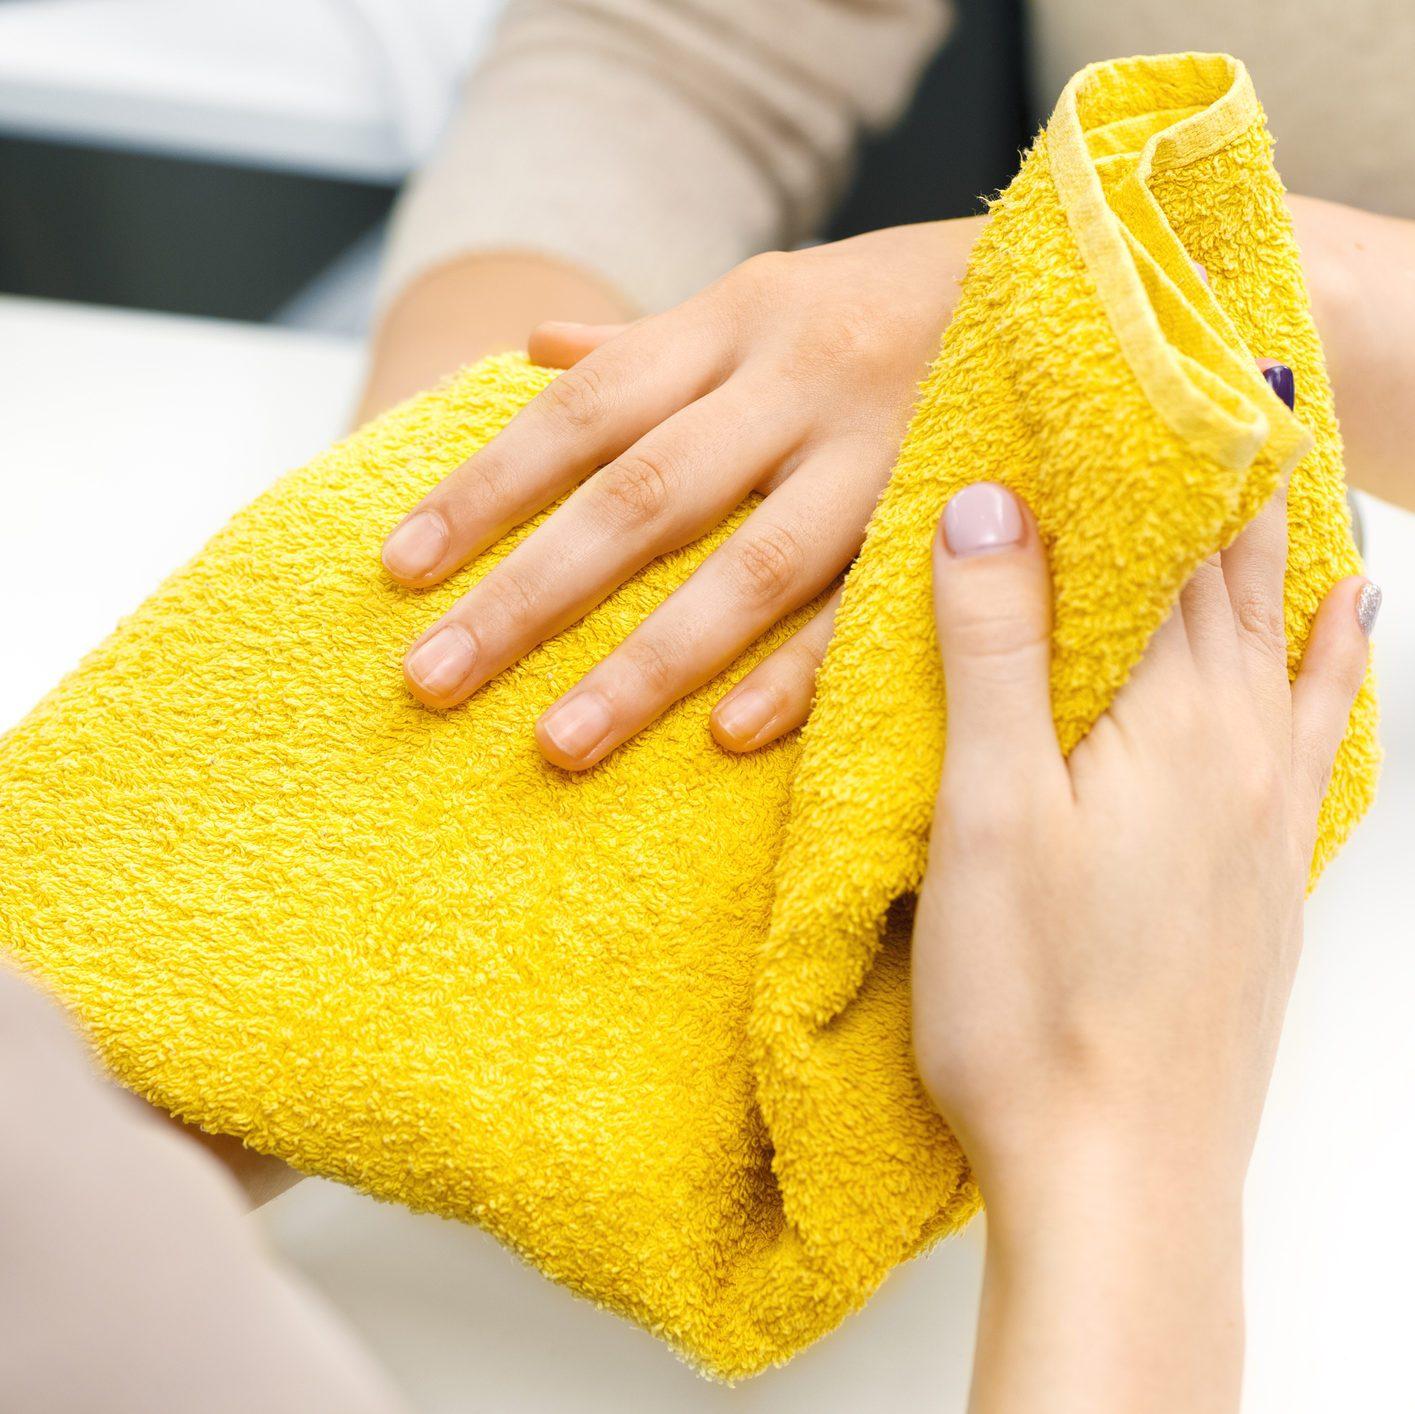 Manicure at the salon